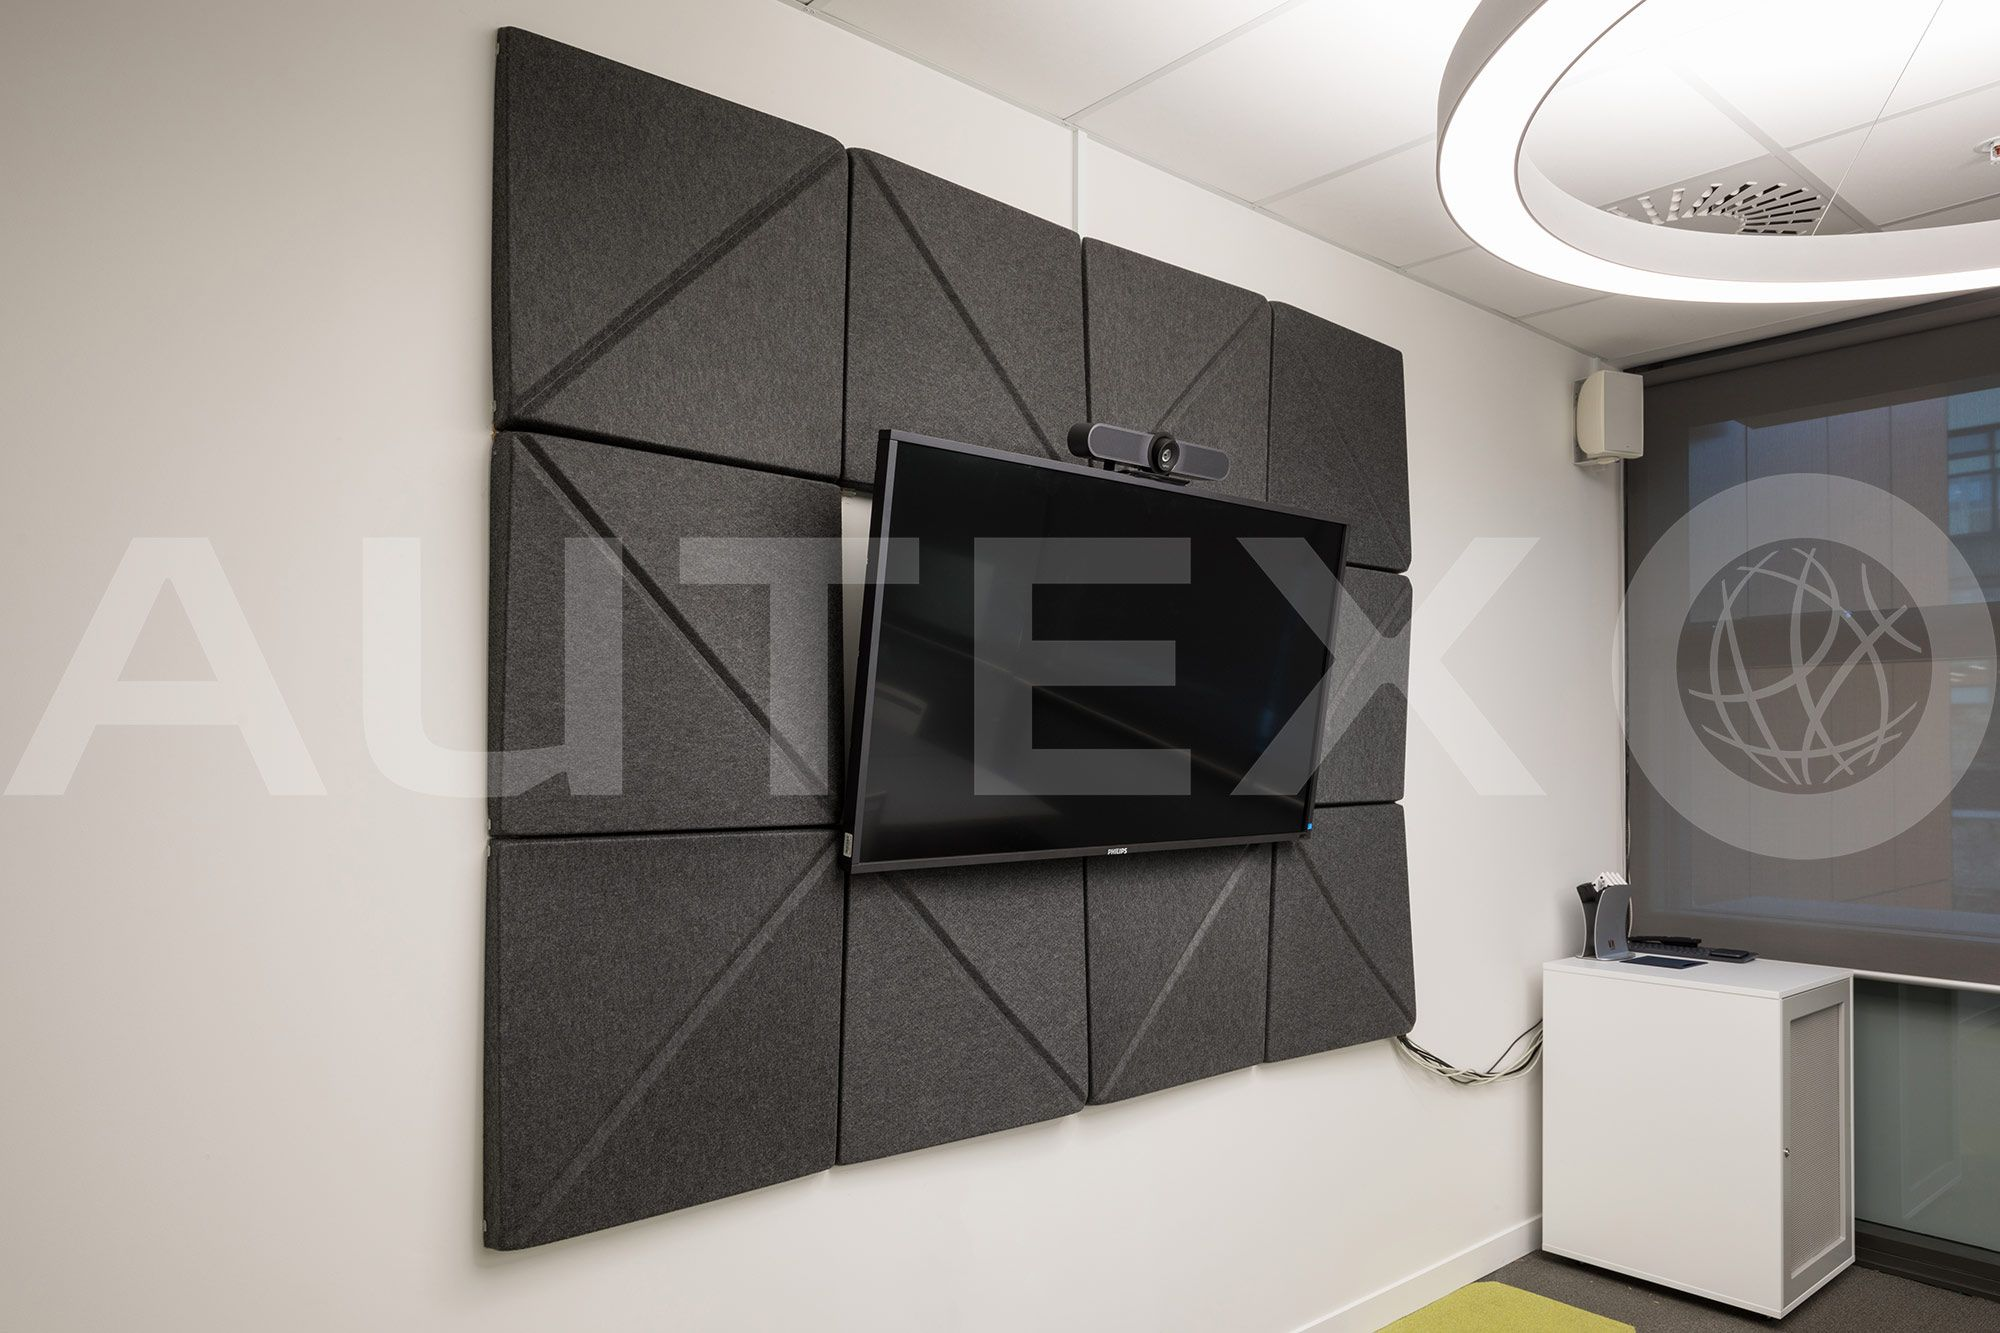 Autex Interior Acoustics 3d Tiles Otago University Dunedin